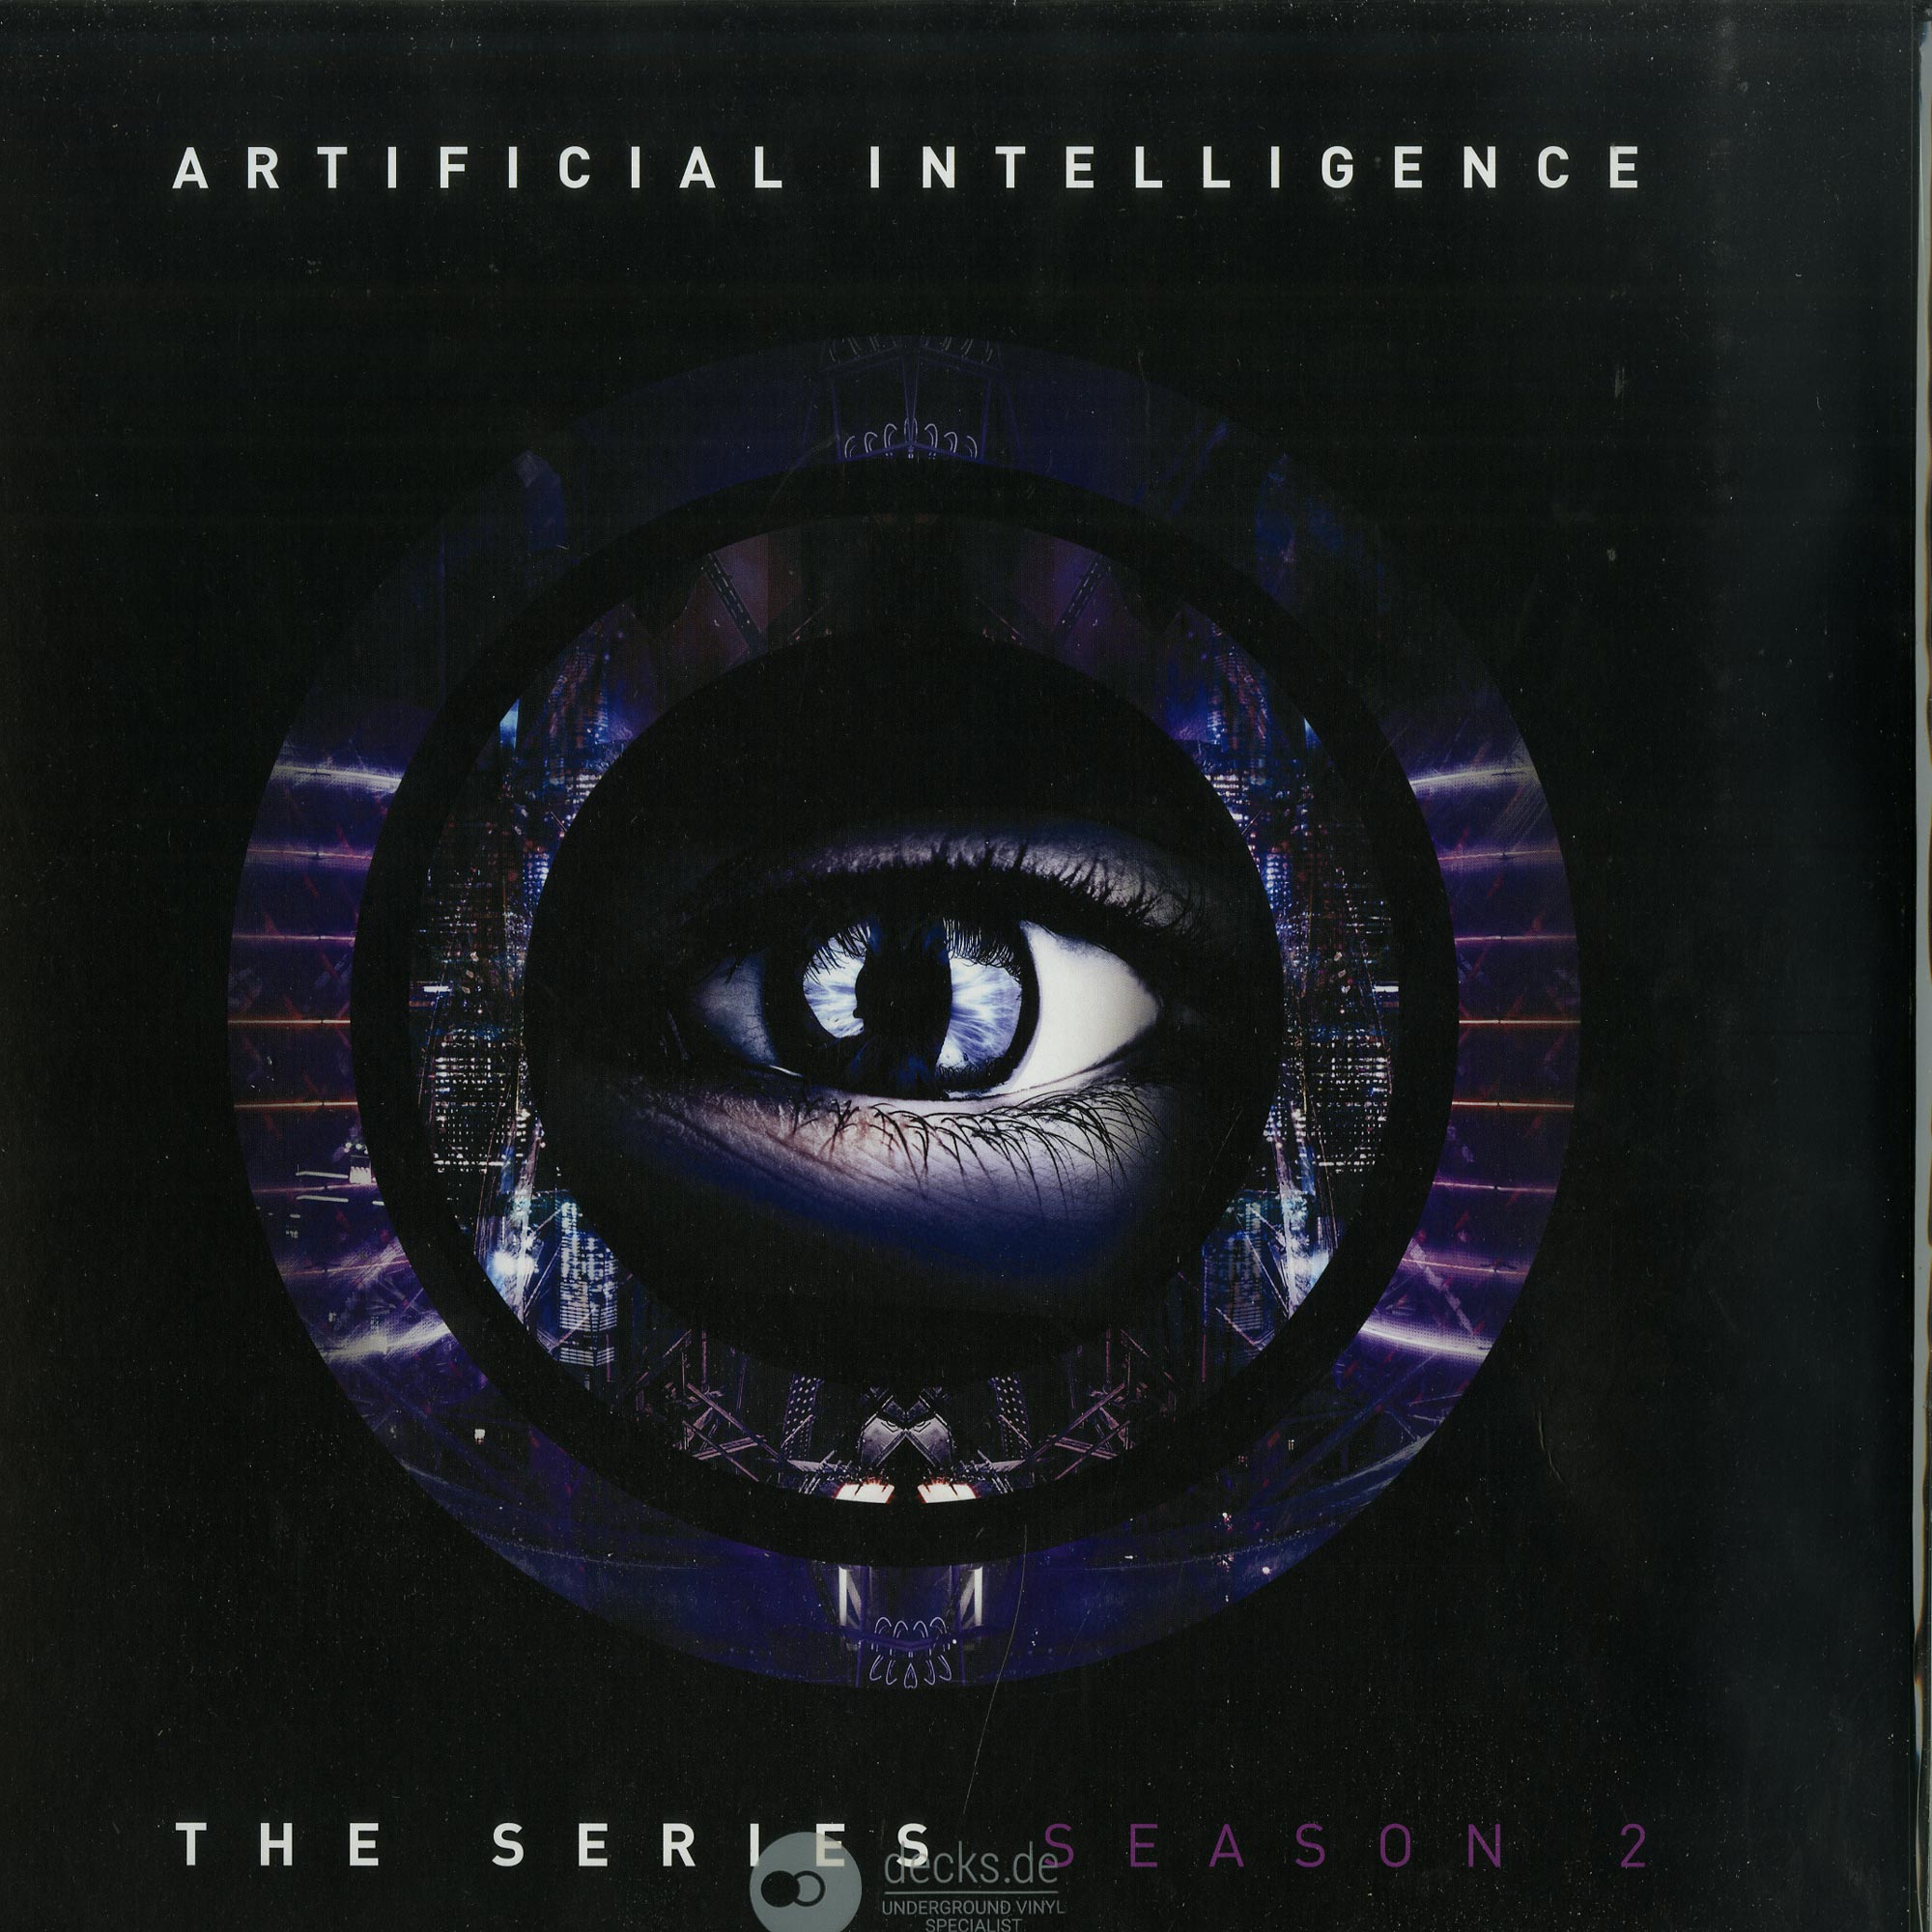 Artificial Intelligence - THE SERIES - SEASON 2